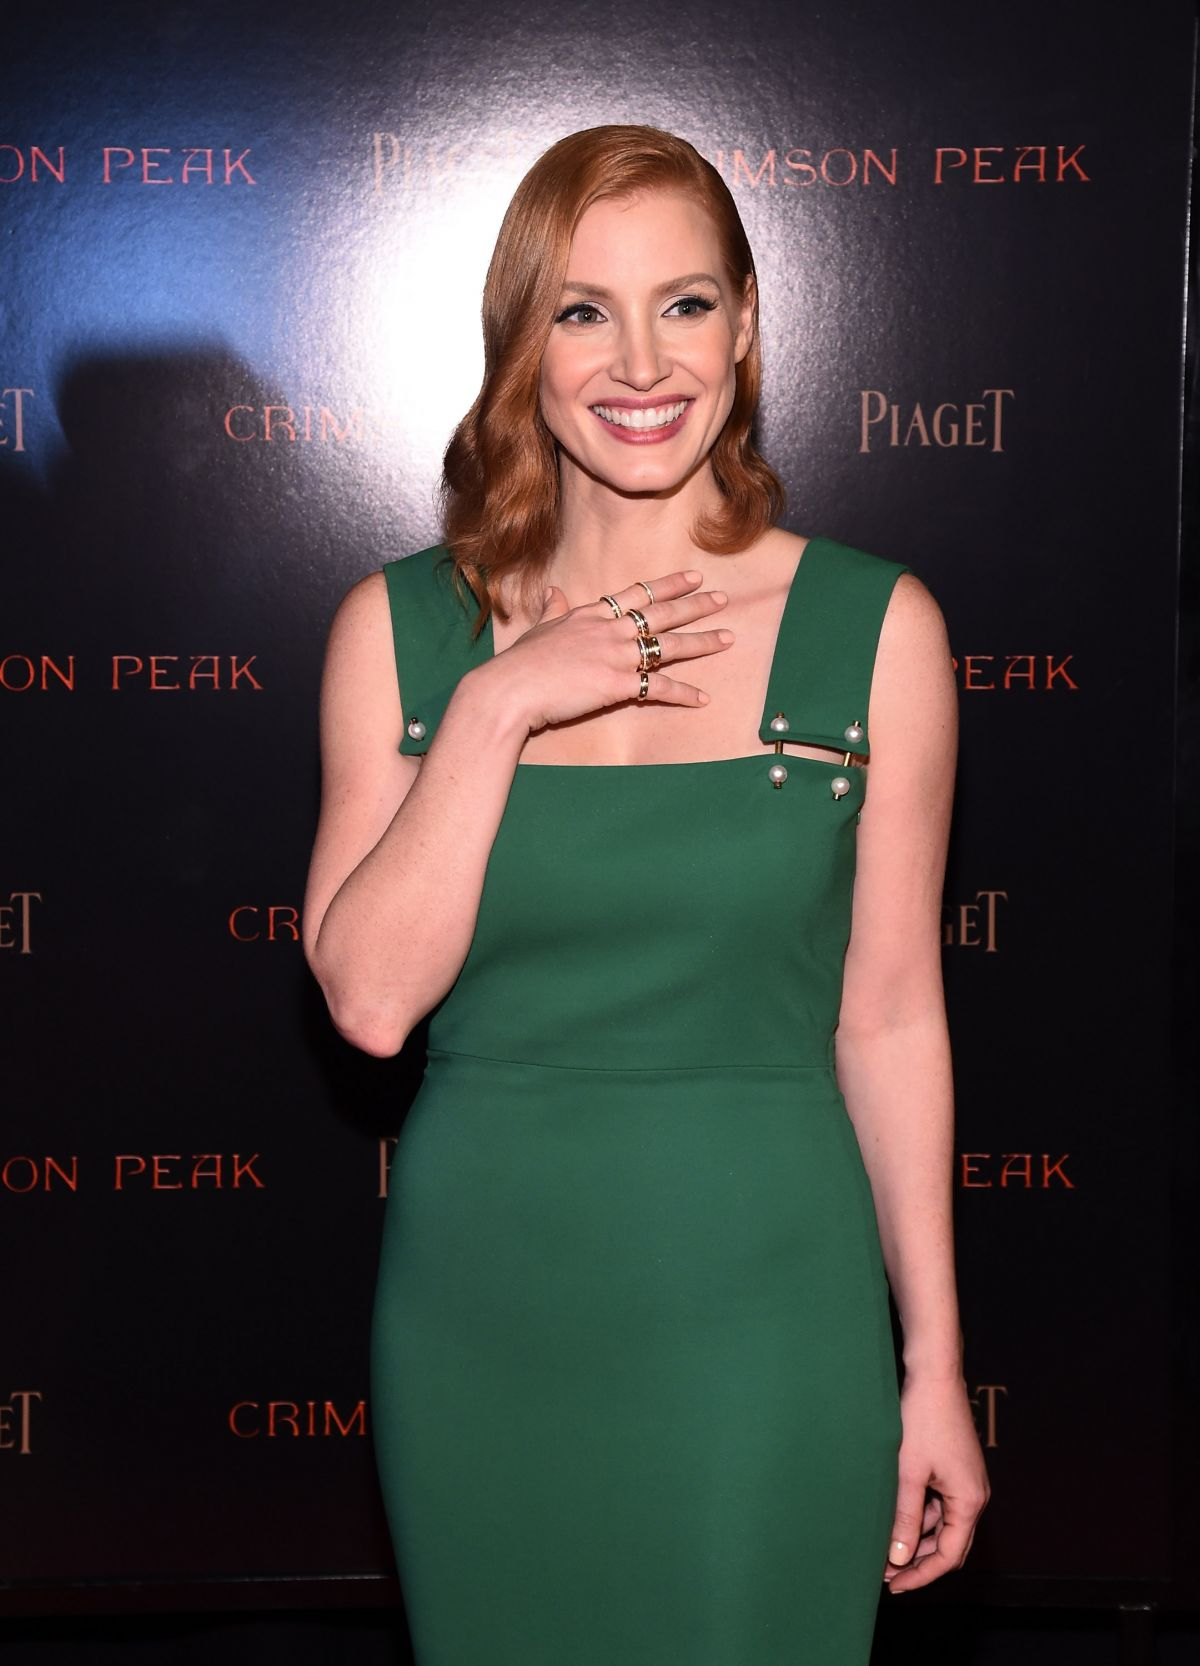 Jessica Chastain wearing a custom Prada dress at the AFI